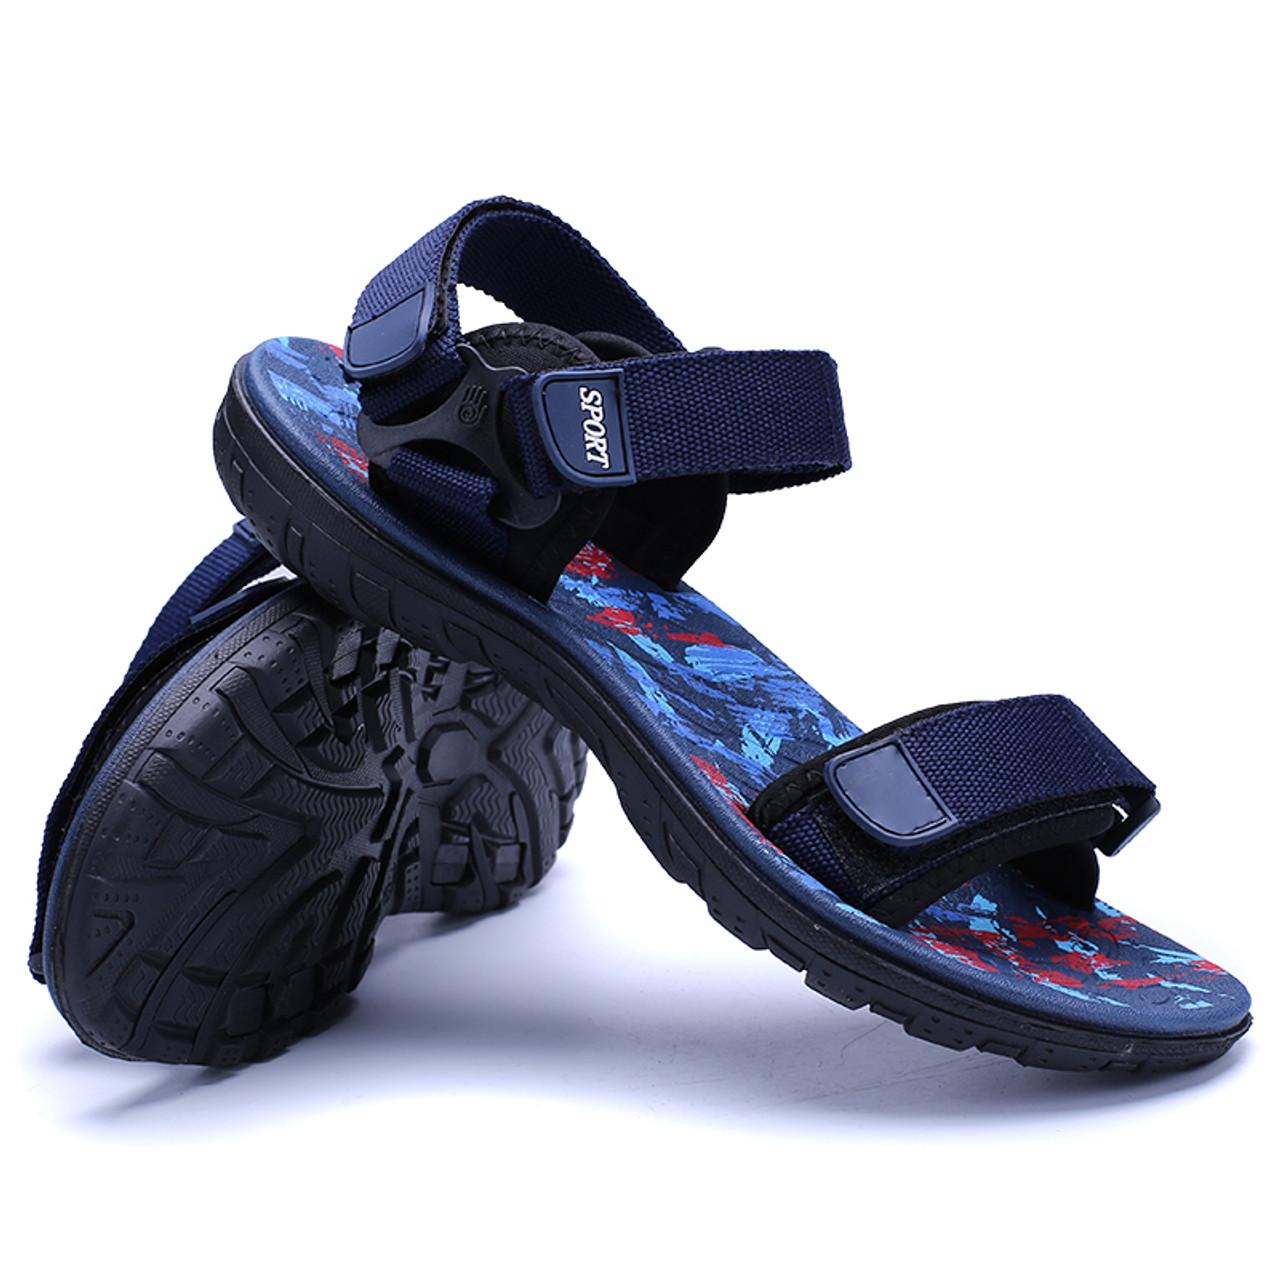 6fb67faf3e ... New Sandals Men Summer Beach Shoes Sandals Designers Mens Sandals  Slippers For Men Zapatos Sandalias Hombre ...